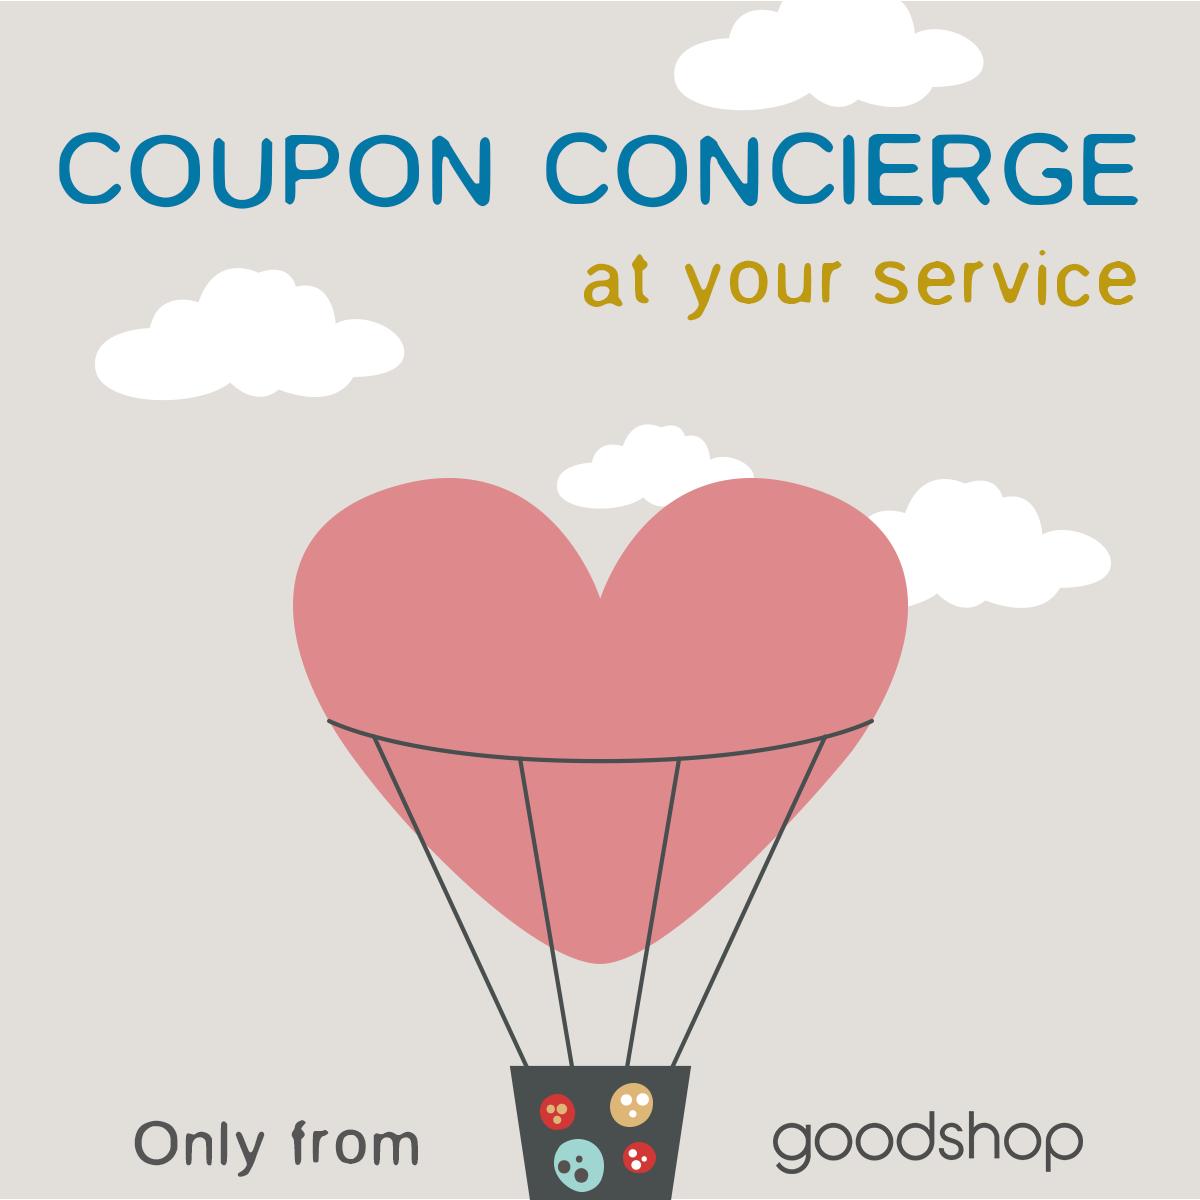 concierge-facebook-1200x1200-03.png